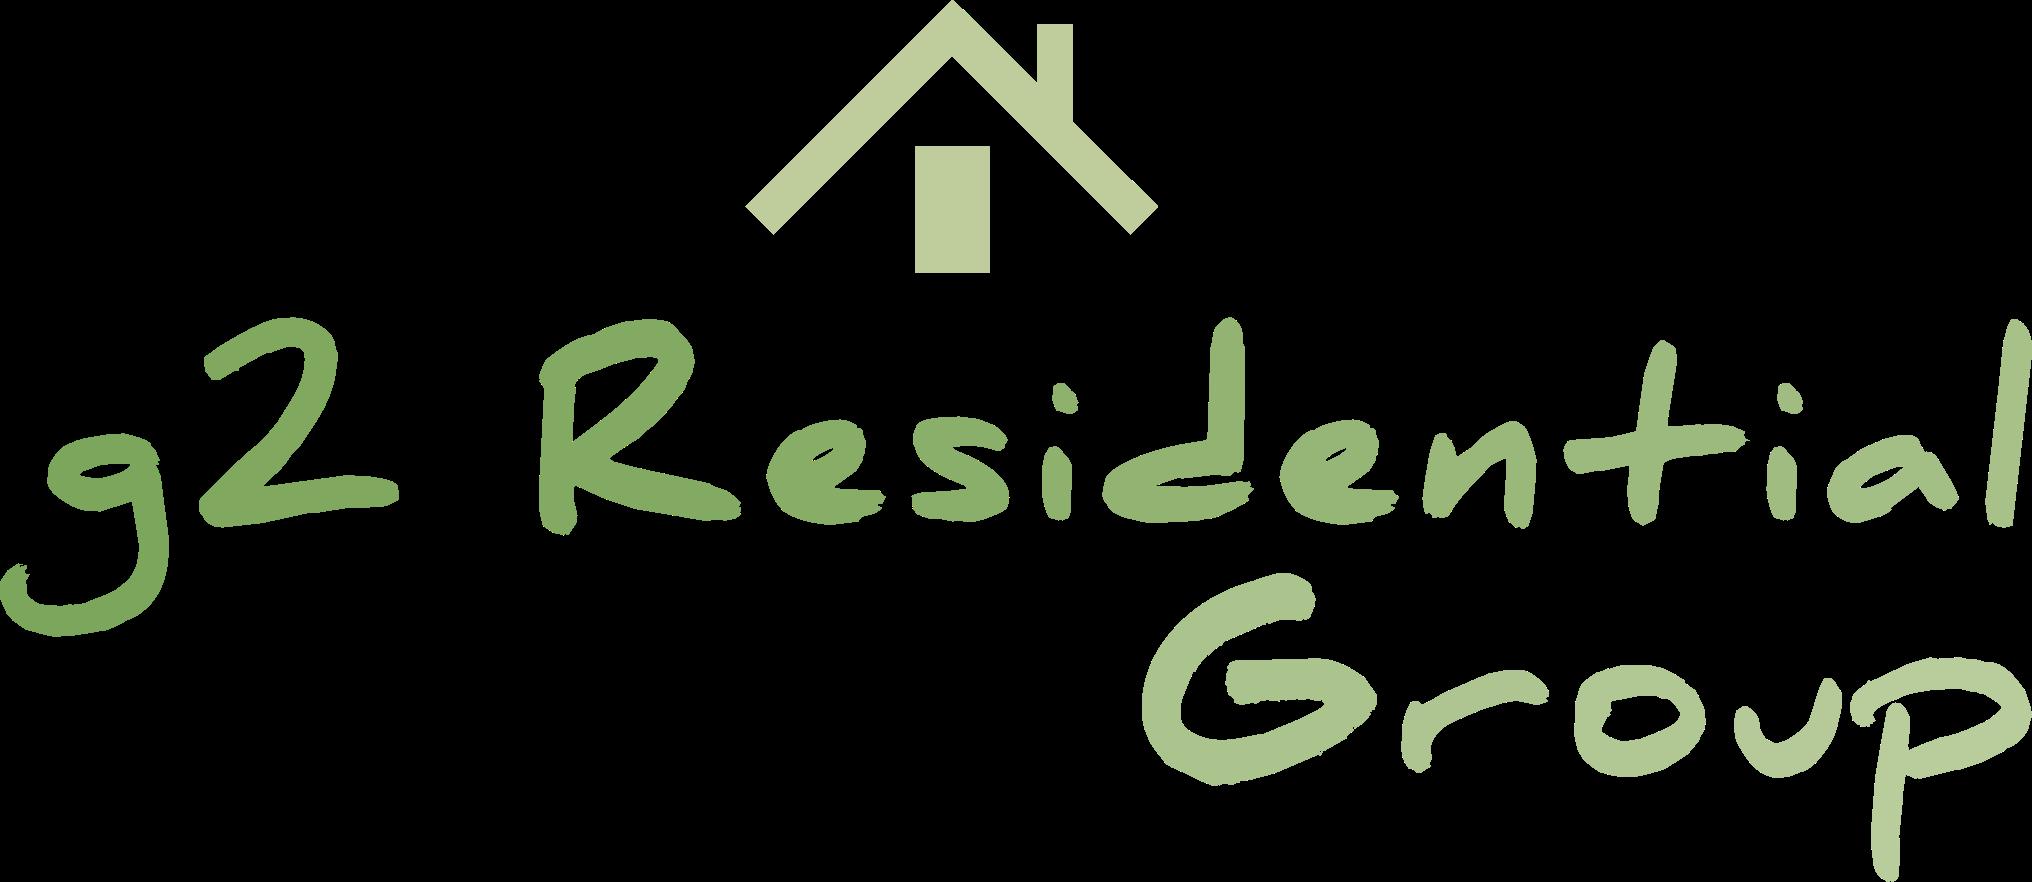 g2 Residential Group